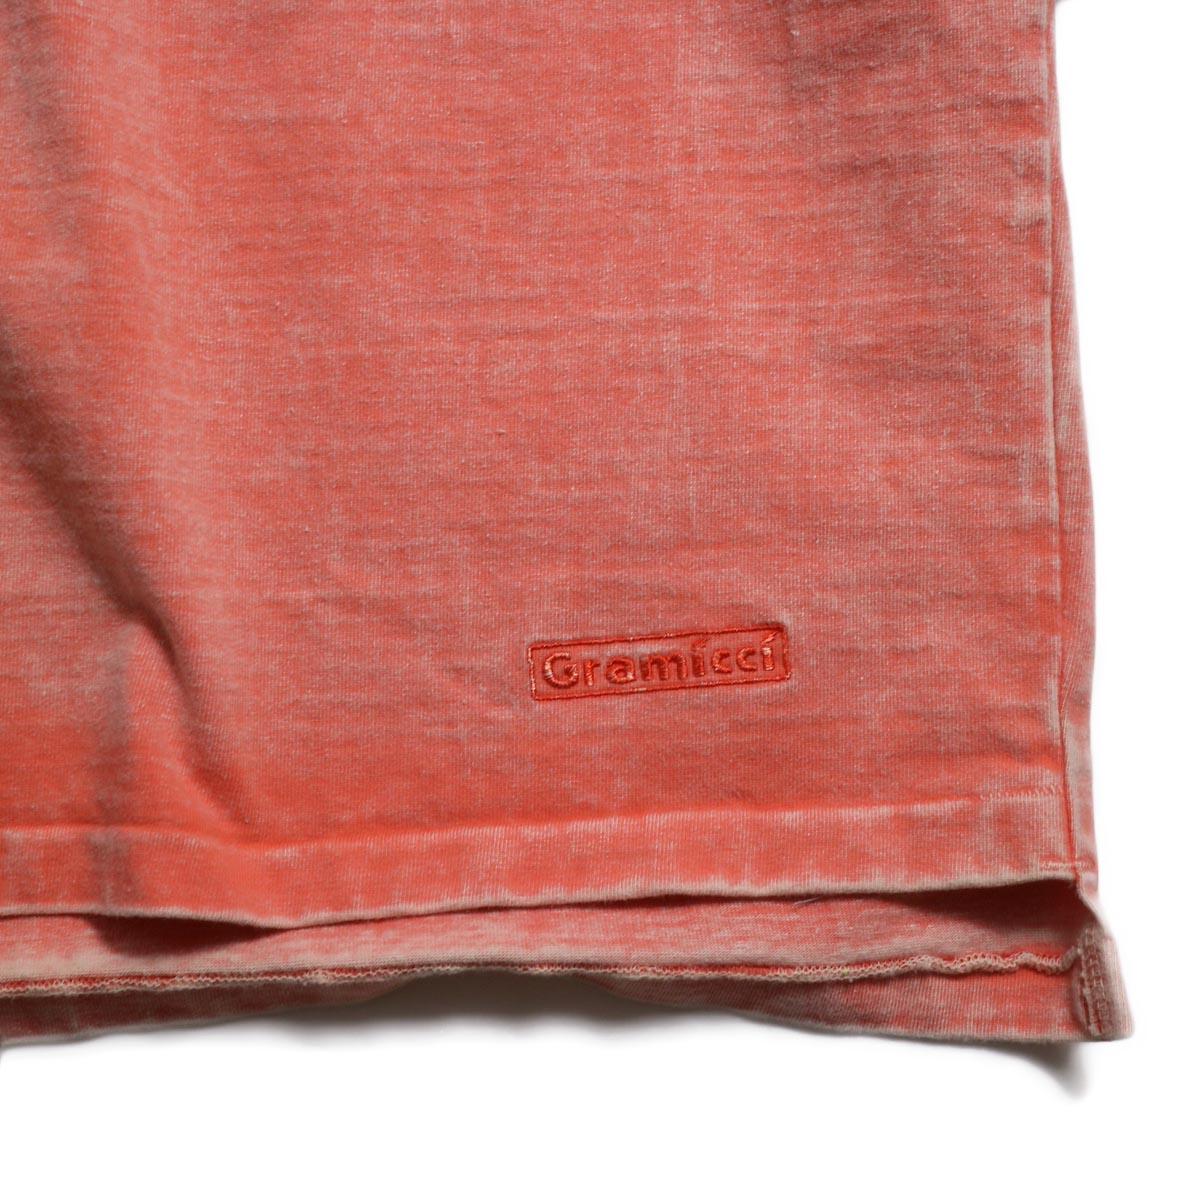 N.HOOLYWOOD × Gramicci  / 191-CS27-024 Short Sleeve Tee -Pink 裾